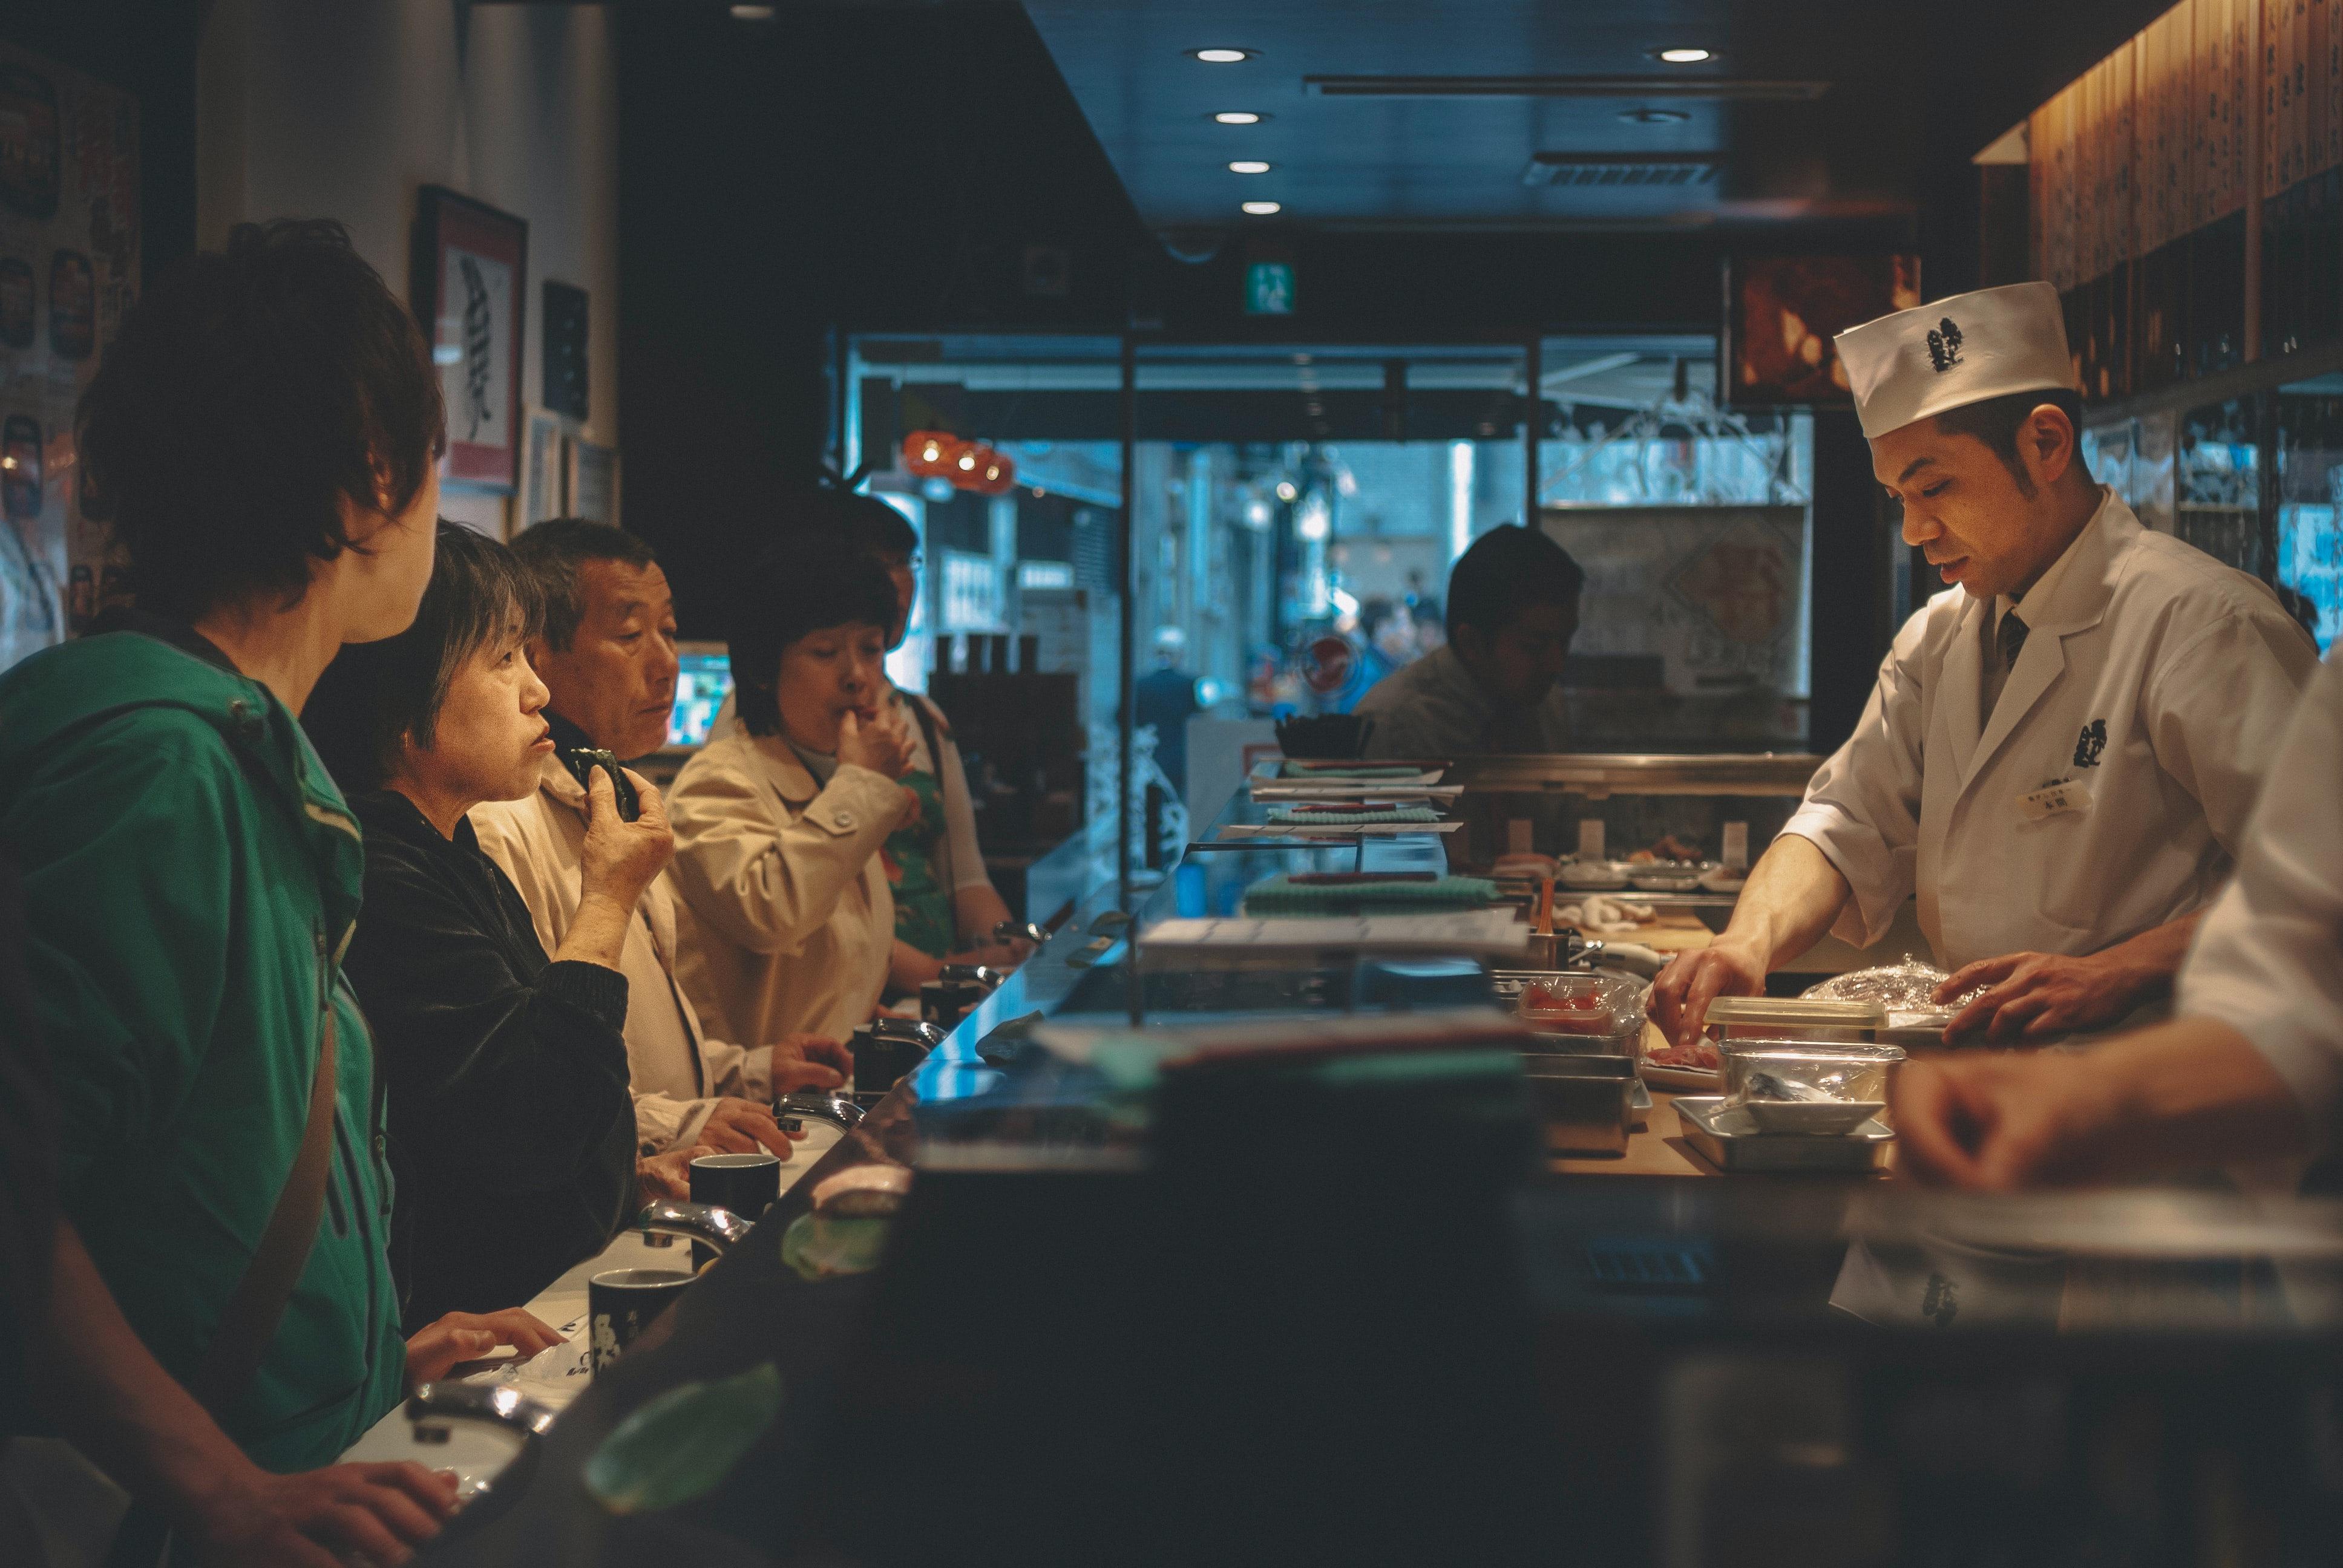 Inside a sushi restaurant